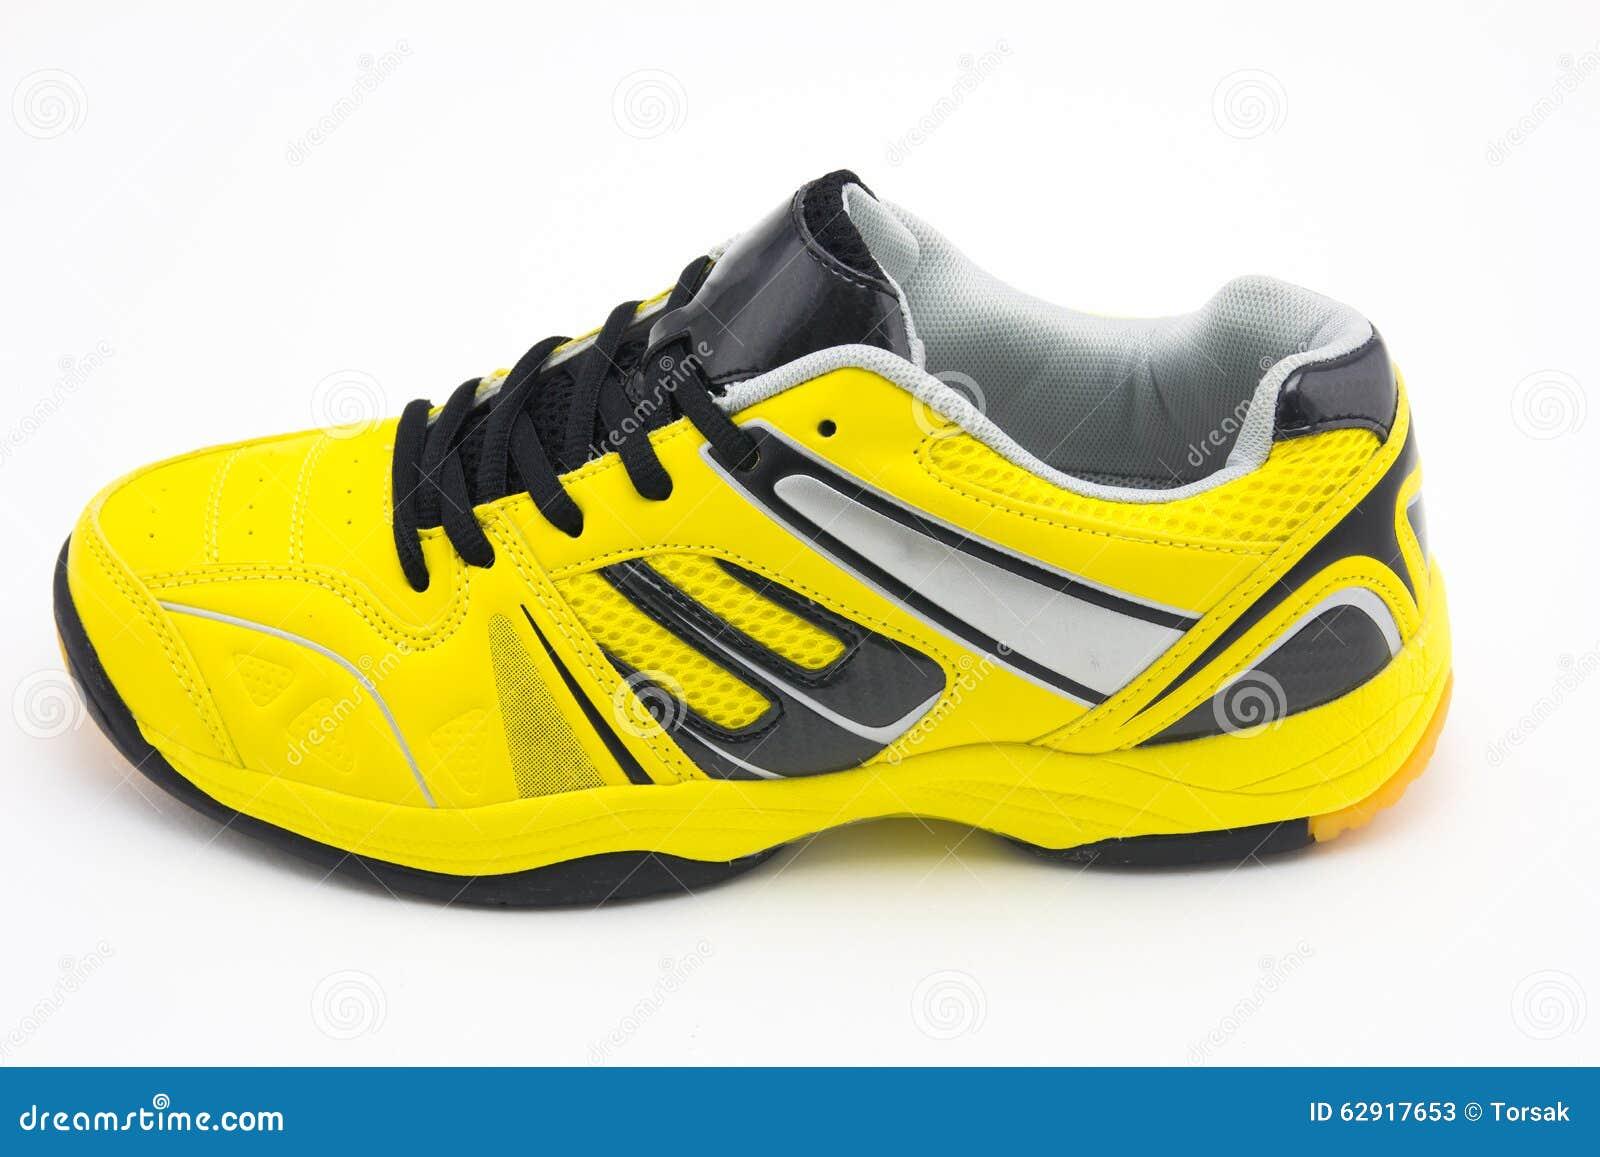 e2613d6099d Κίτρινα αθλητικά παπούτσια στοκ εικόνα. εικόνα από χαμηλός - 62917653